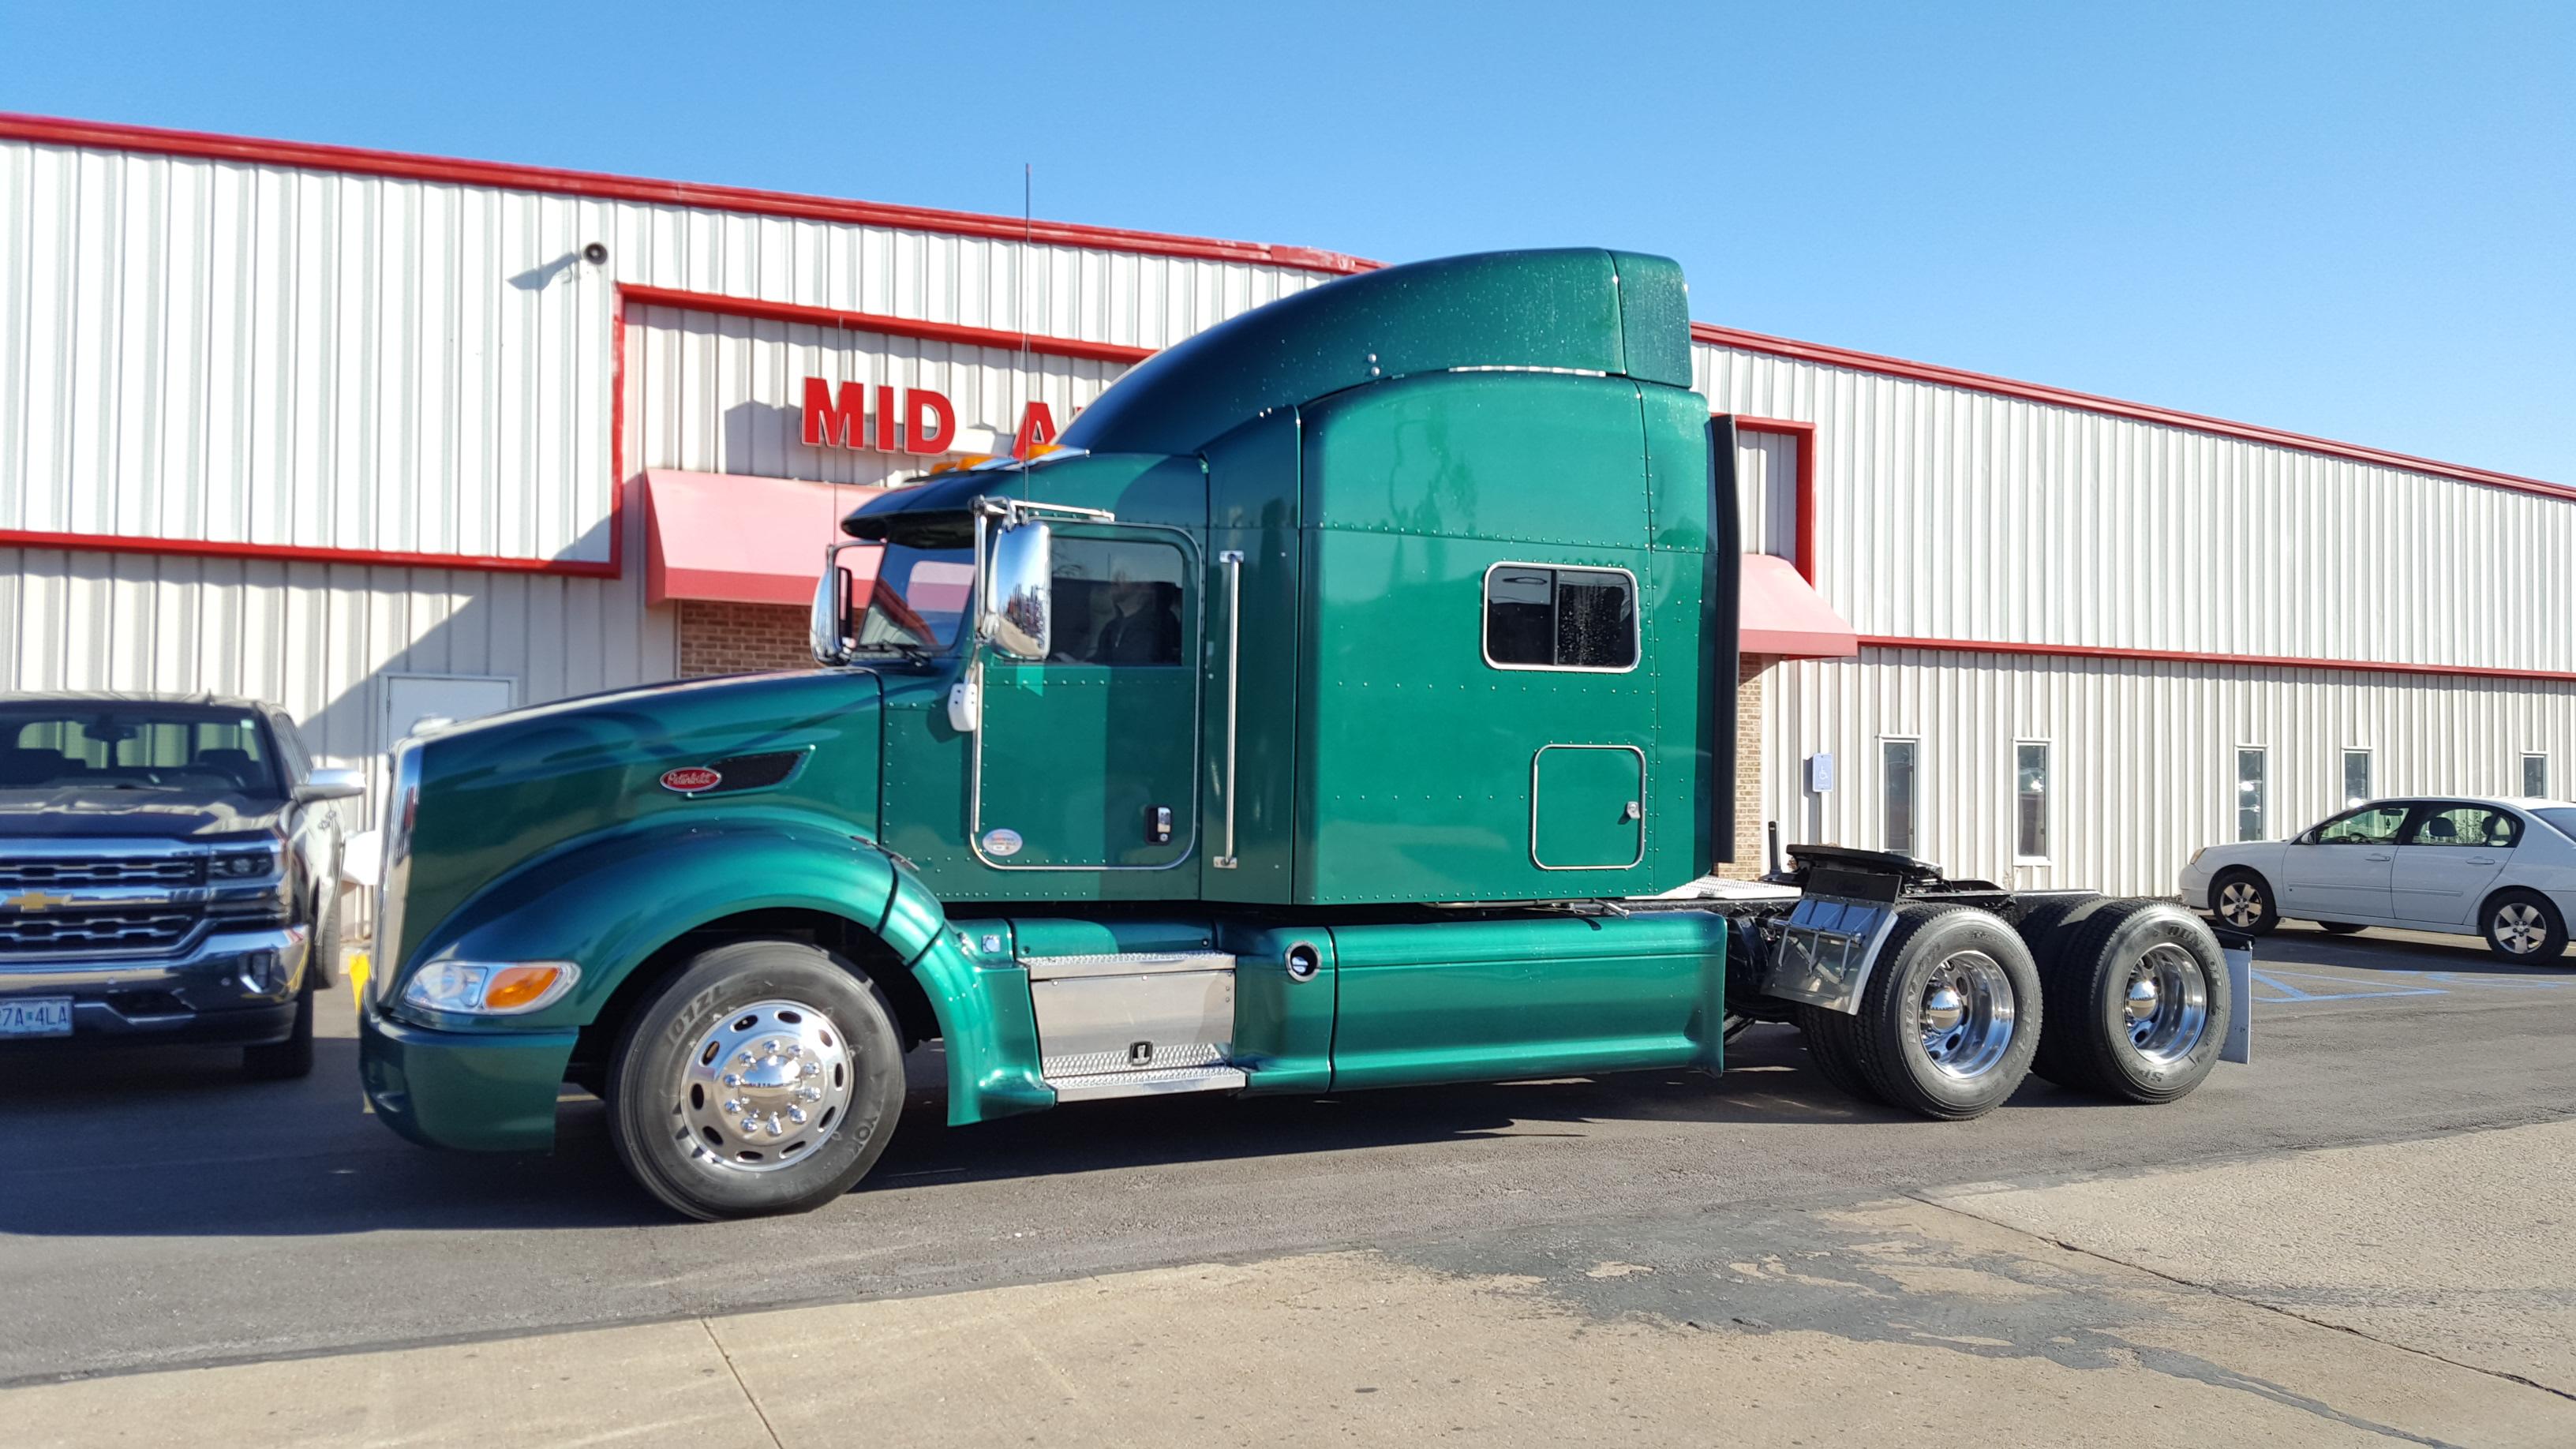 Peterbilt Commercial Truck Search | TLG